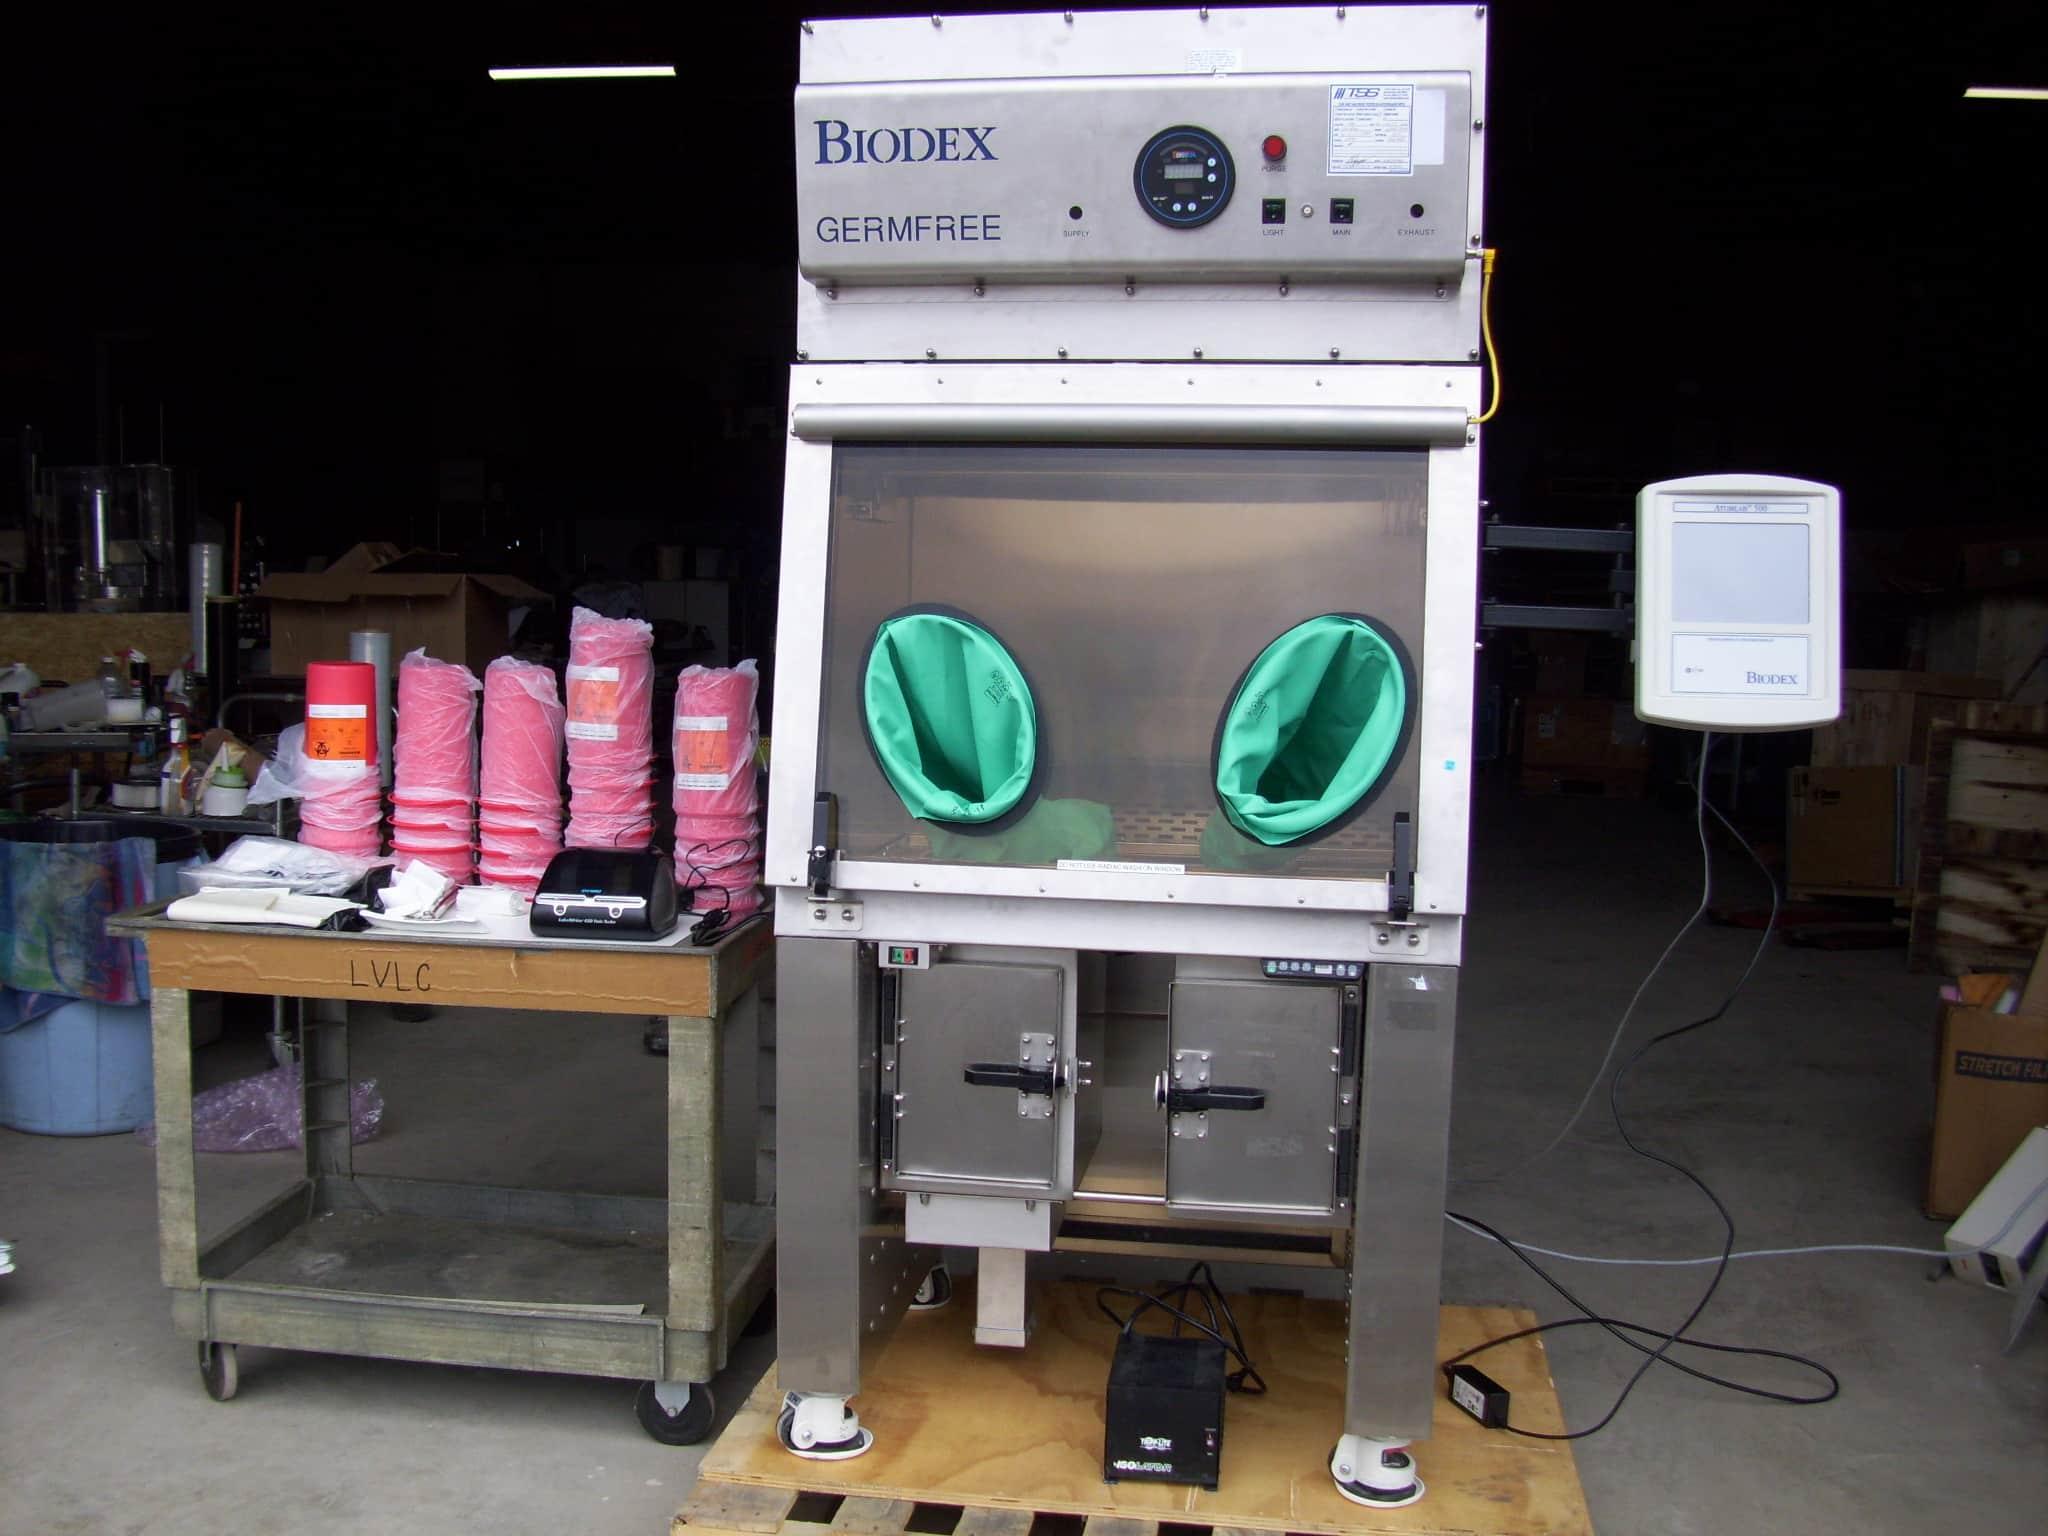 Biodex Germfree LFGI-3RUSP  Portable Shielded Isolator Laminar Flow Nuclear Medicine Atomlab 500 Dose Calibrator